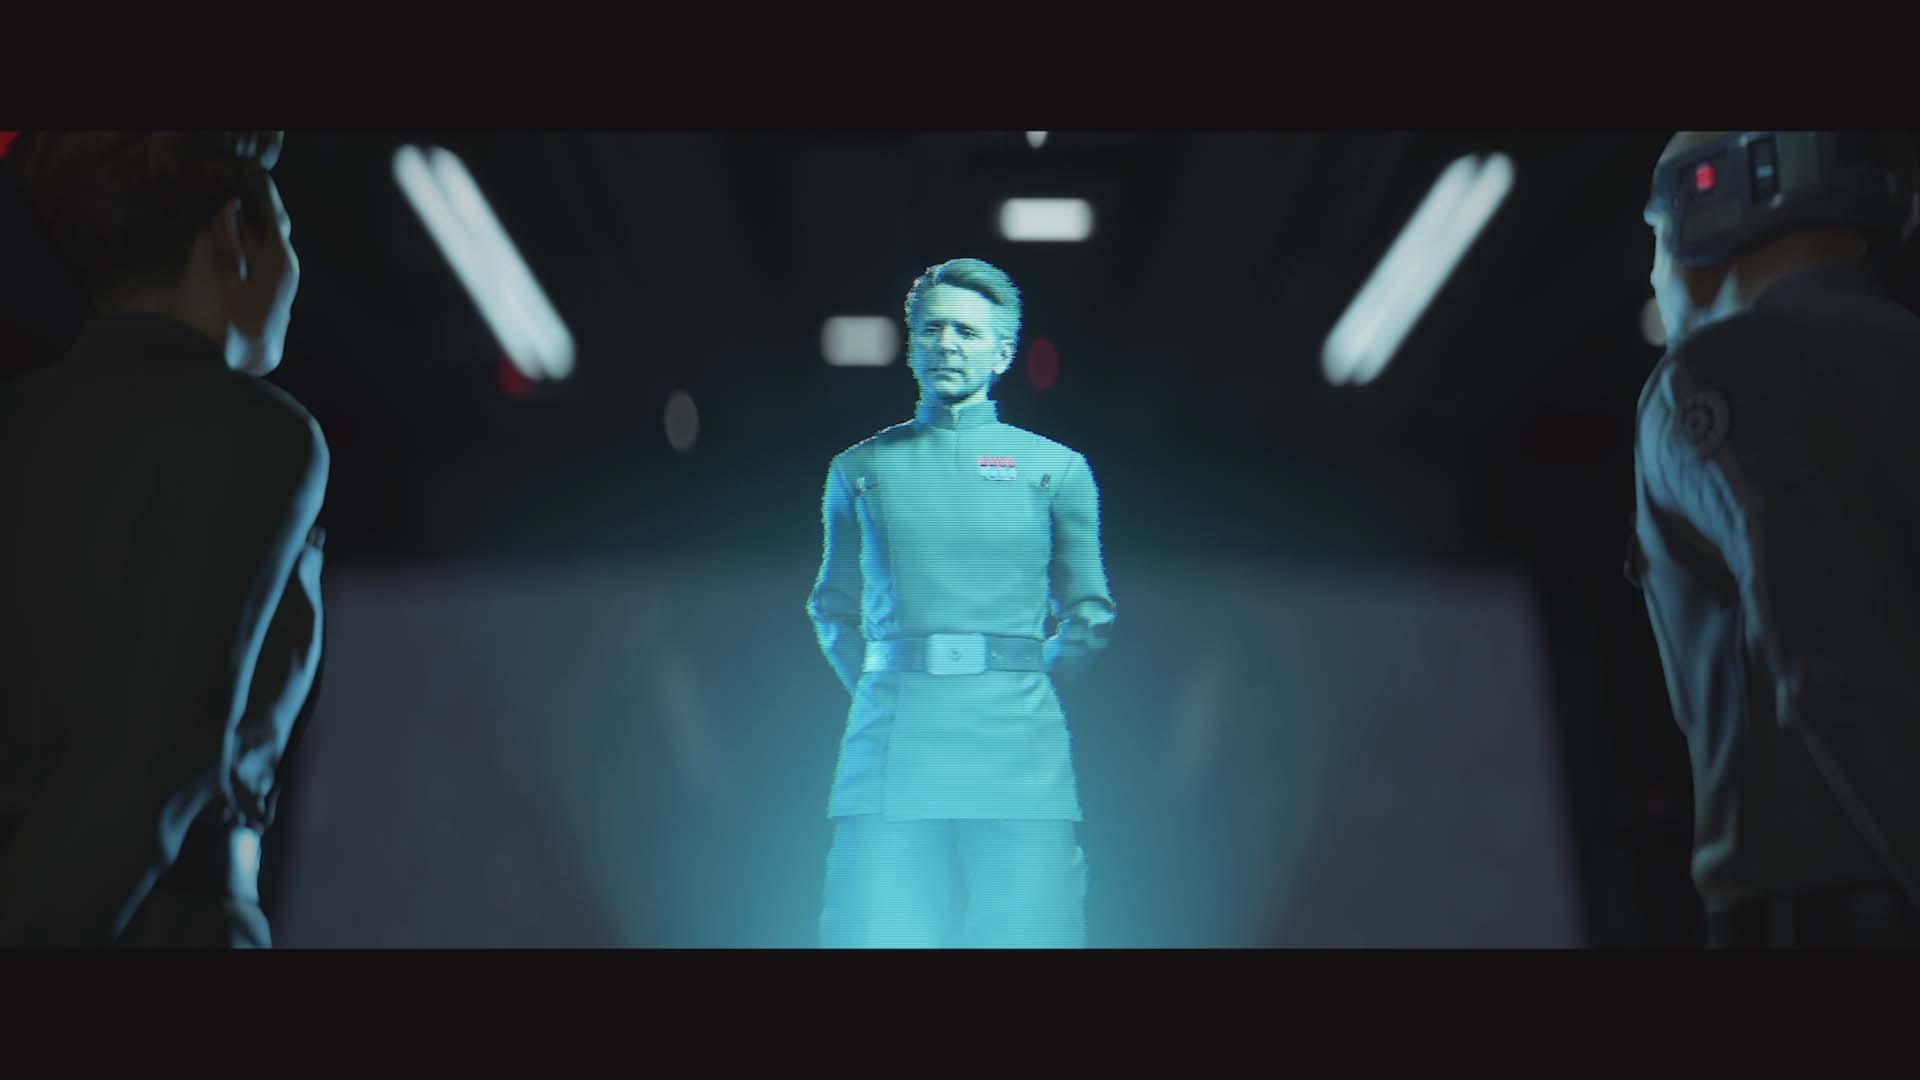 Star-Wars-Squadrons-Gameblog -33-